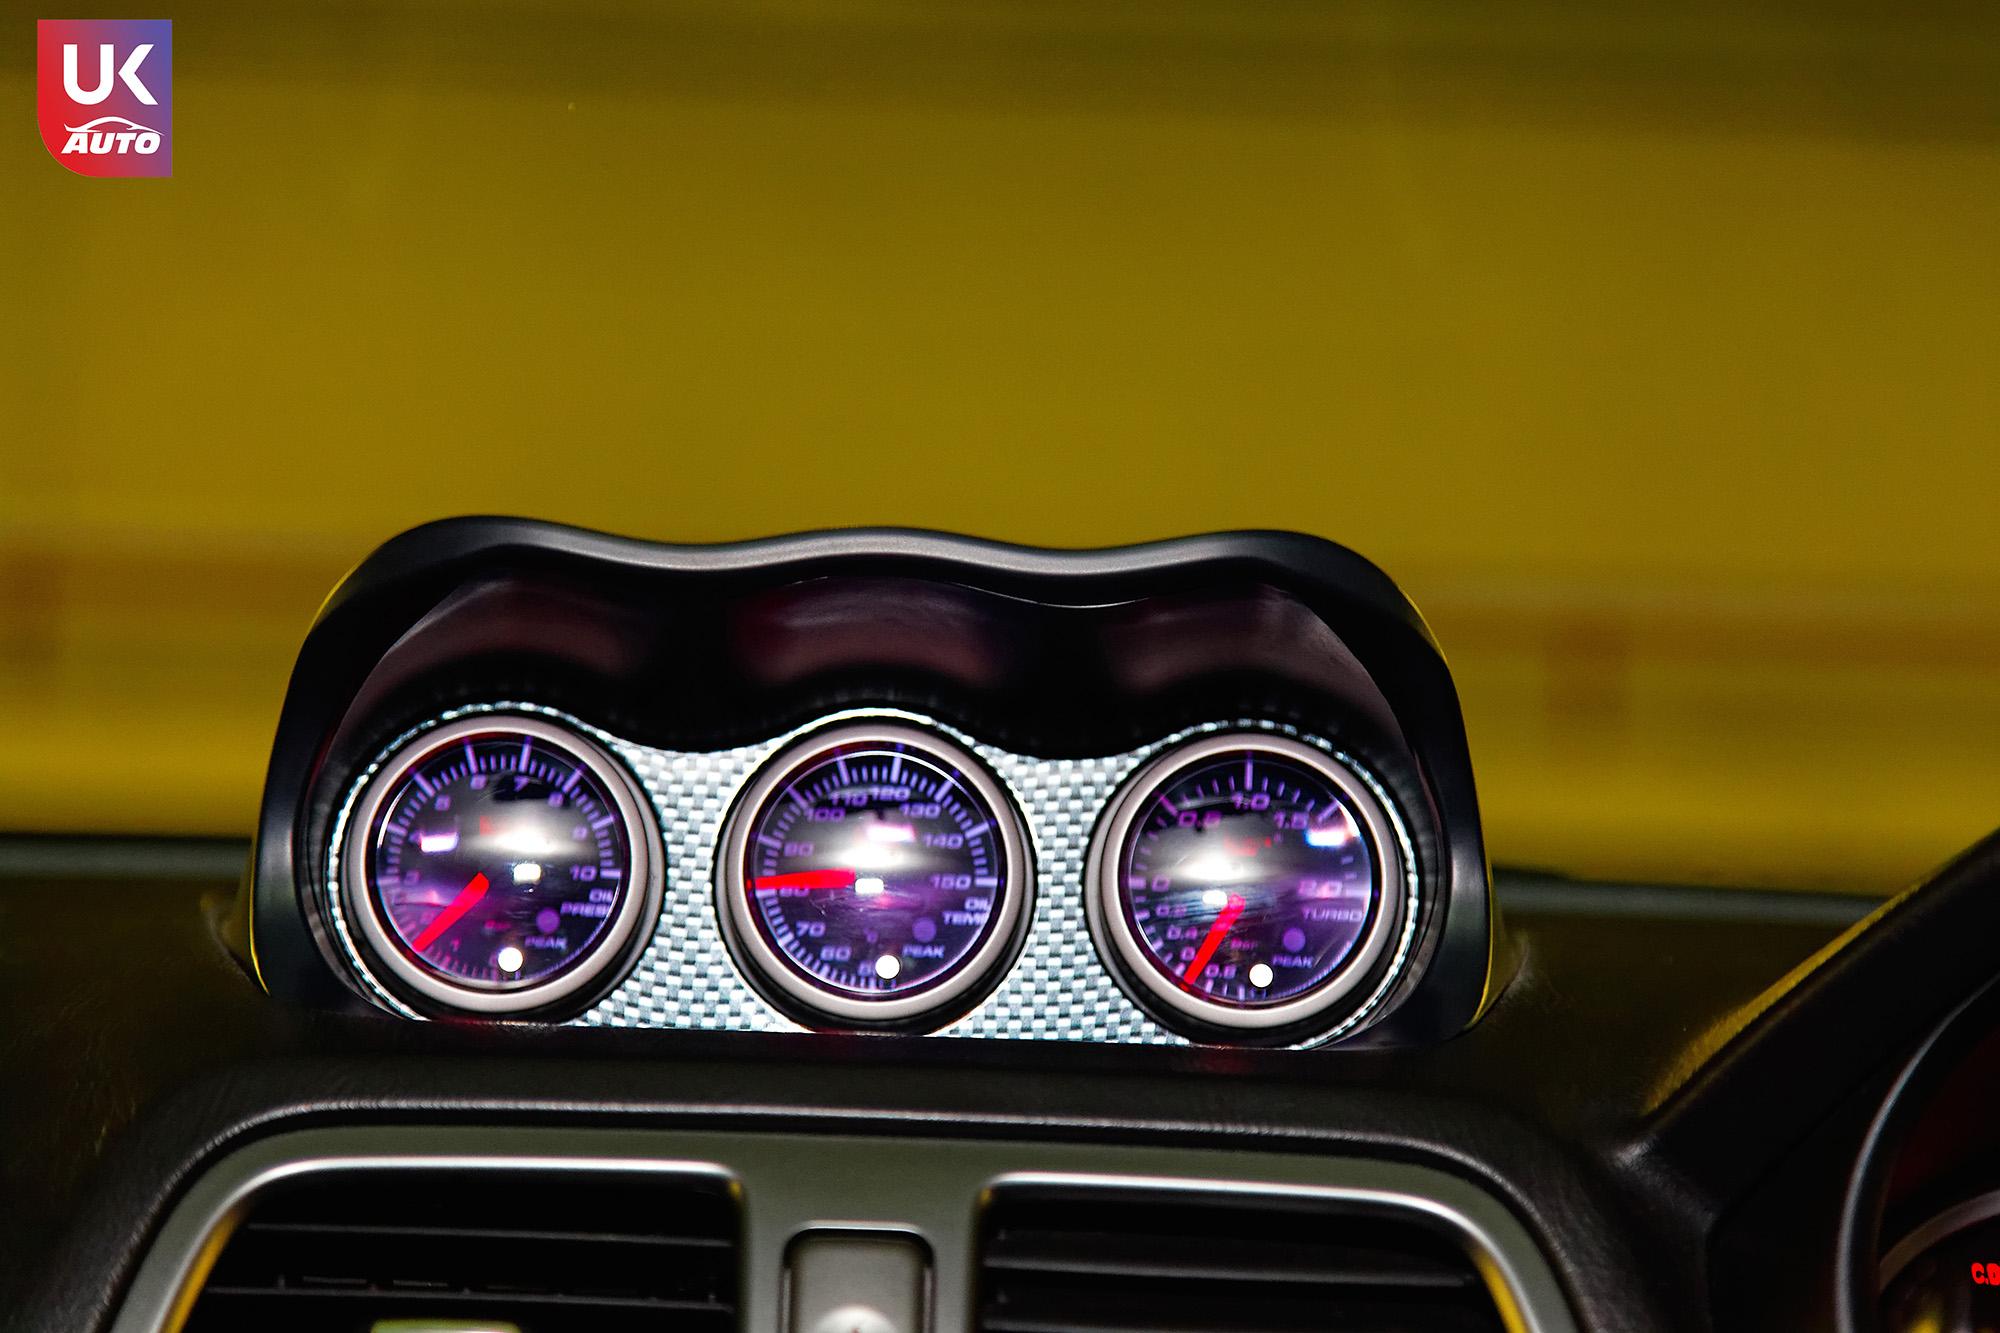 import subaru impreza wrx sti rhd import voiture angleterre auto import12 - Felecitation a Christophe pour cette Subaru Impreza Wrx Sti RHD Supercharged Importation voiture angleterre